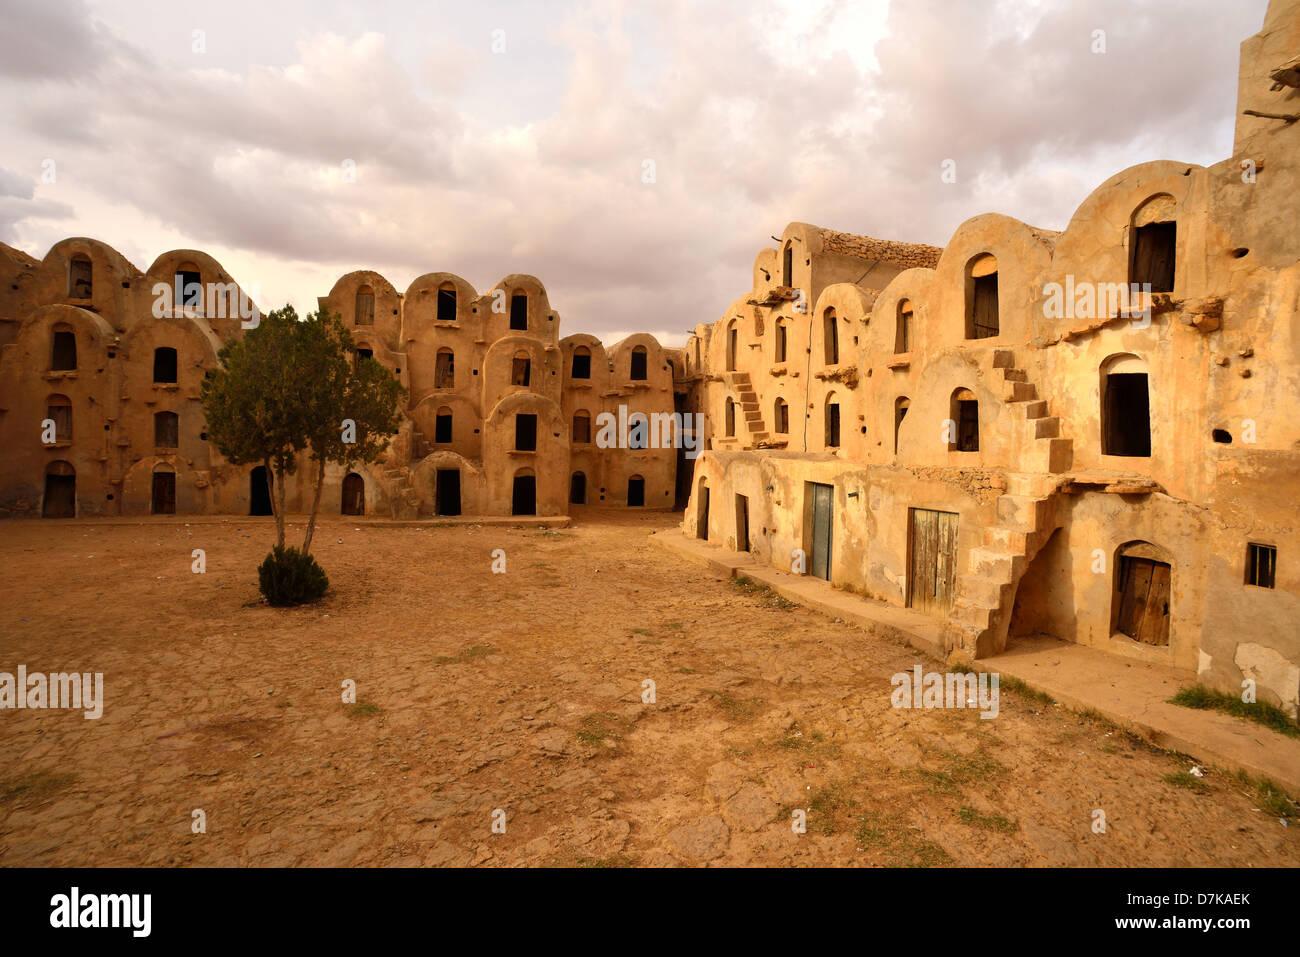 Ksar Ezahara, Tataouine Province, Tunesia. - Stock Image